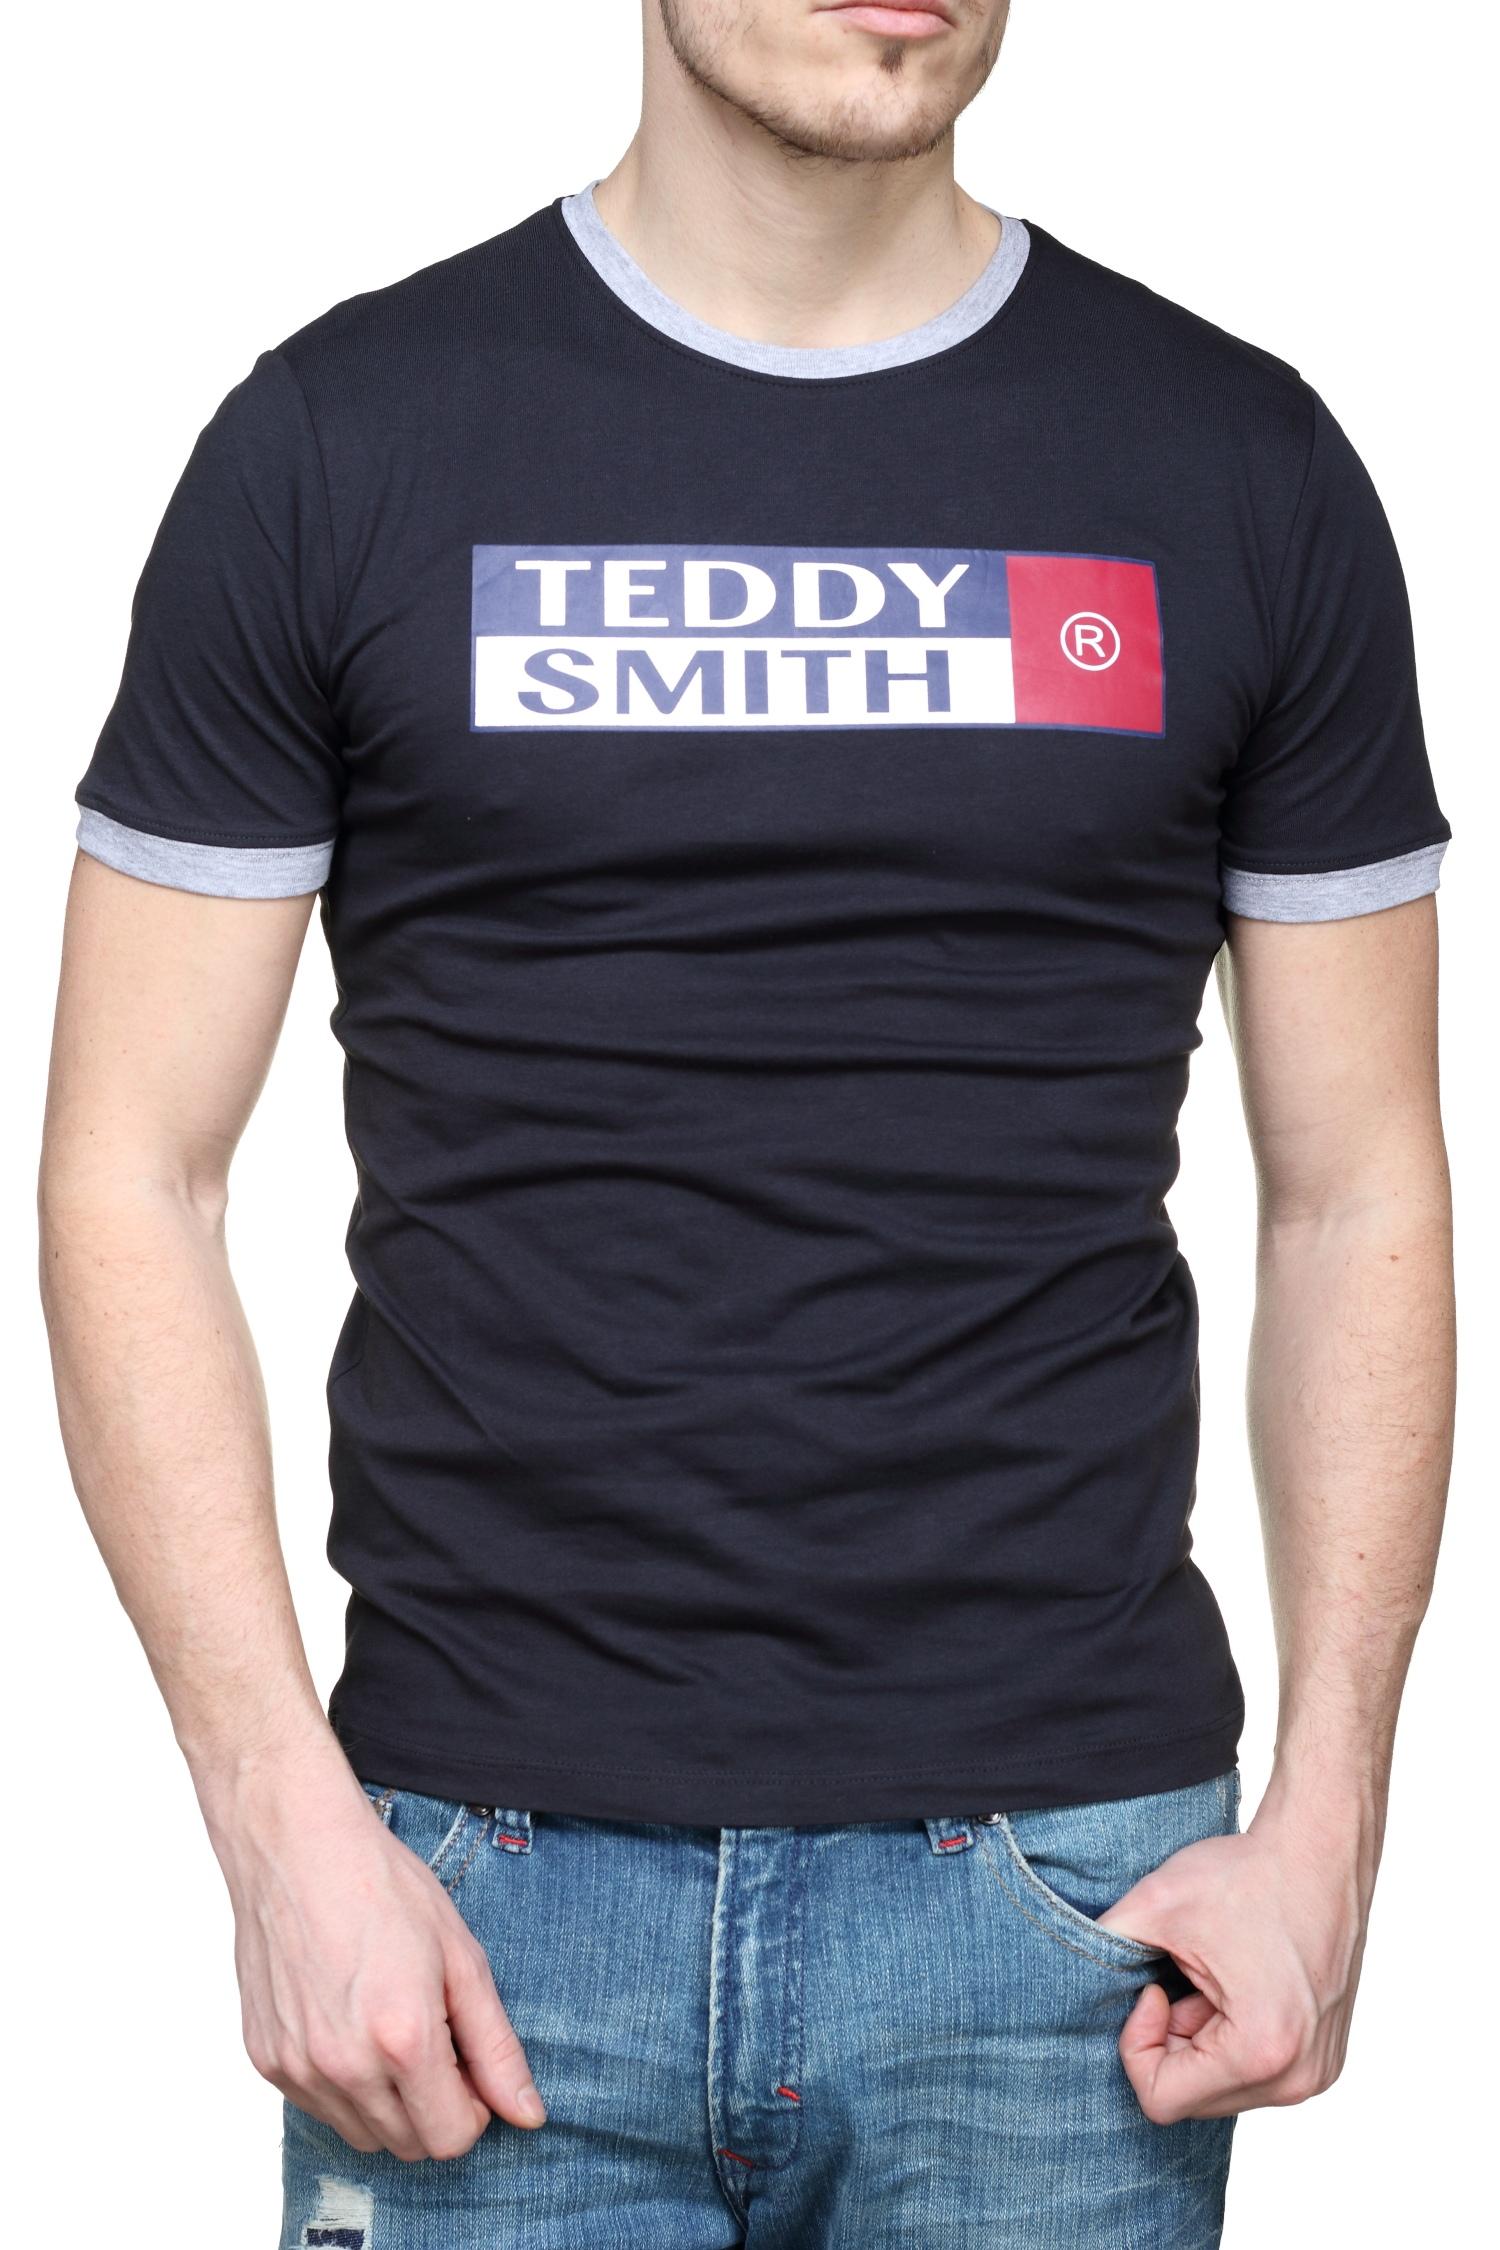 http://www.leadermode.com/163517/teddy-smith-tozo-mc-11013353d-351-dark-navy.jpg